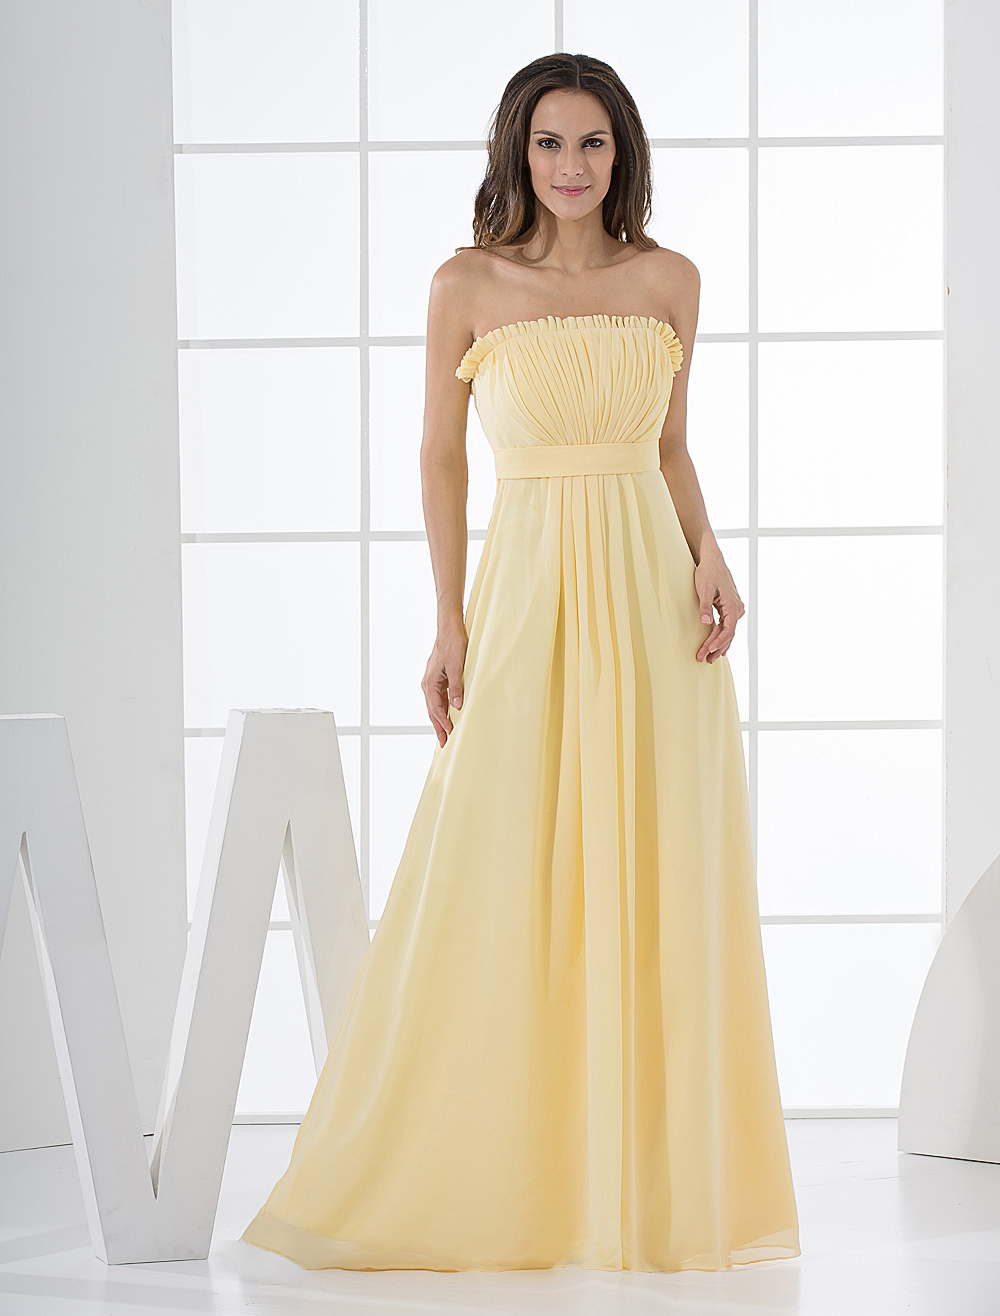 Daffodil Chiffon A-line Strapless Floor Length Bridesmaid Dress